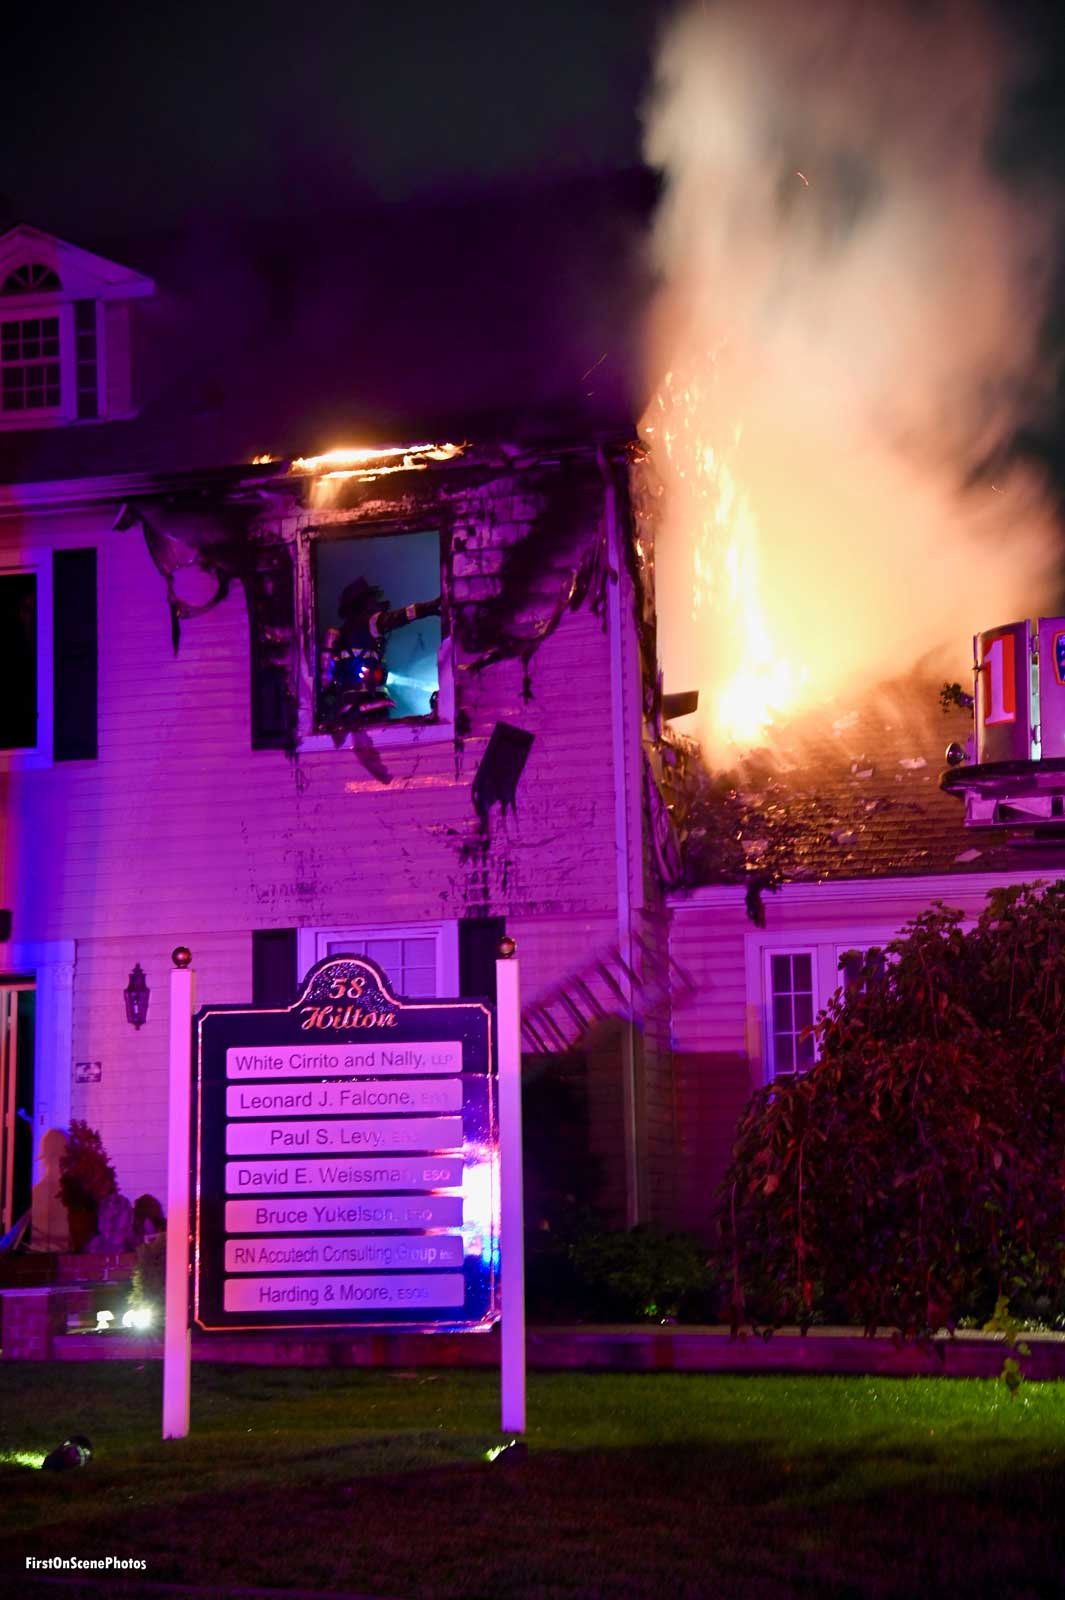 A structure fire in Hempstead on Long Island